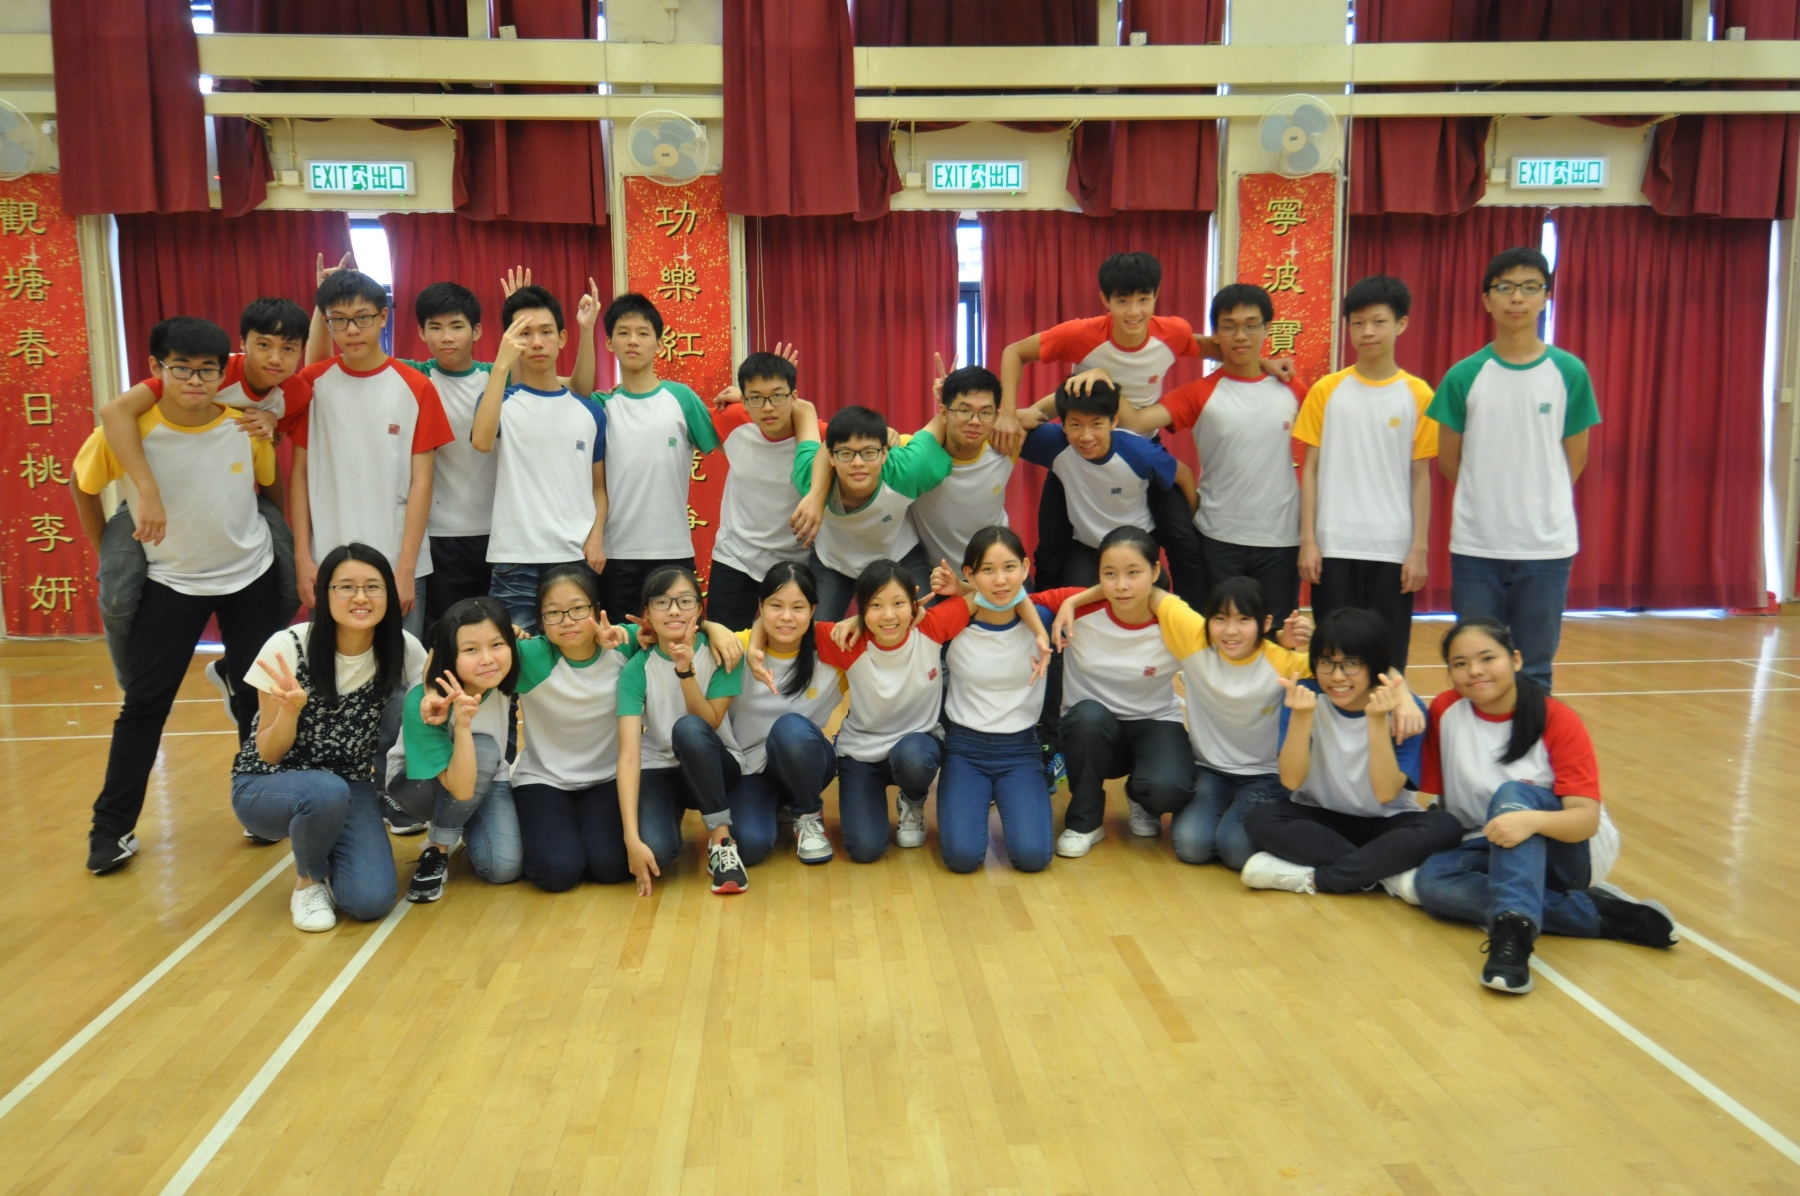 http://npc.edu.hk/sites/default/files/dsc_0748.jpg